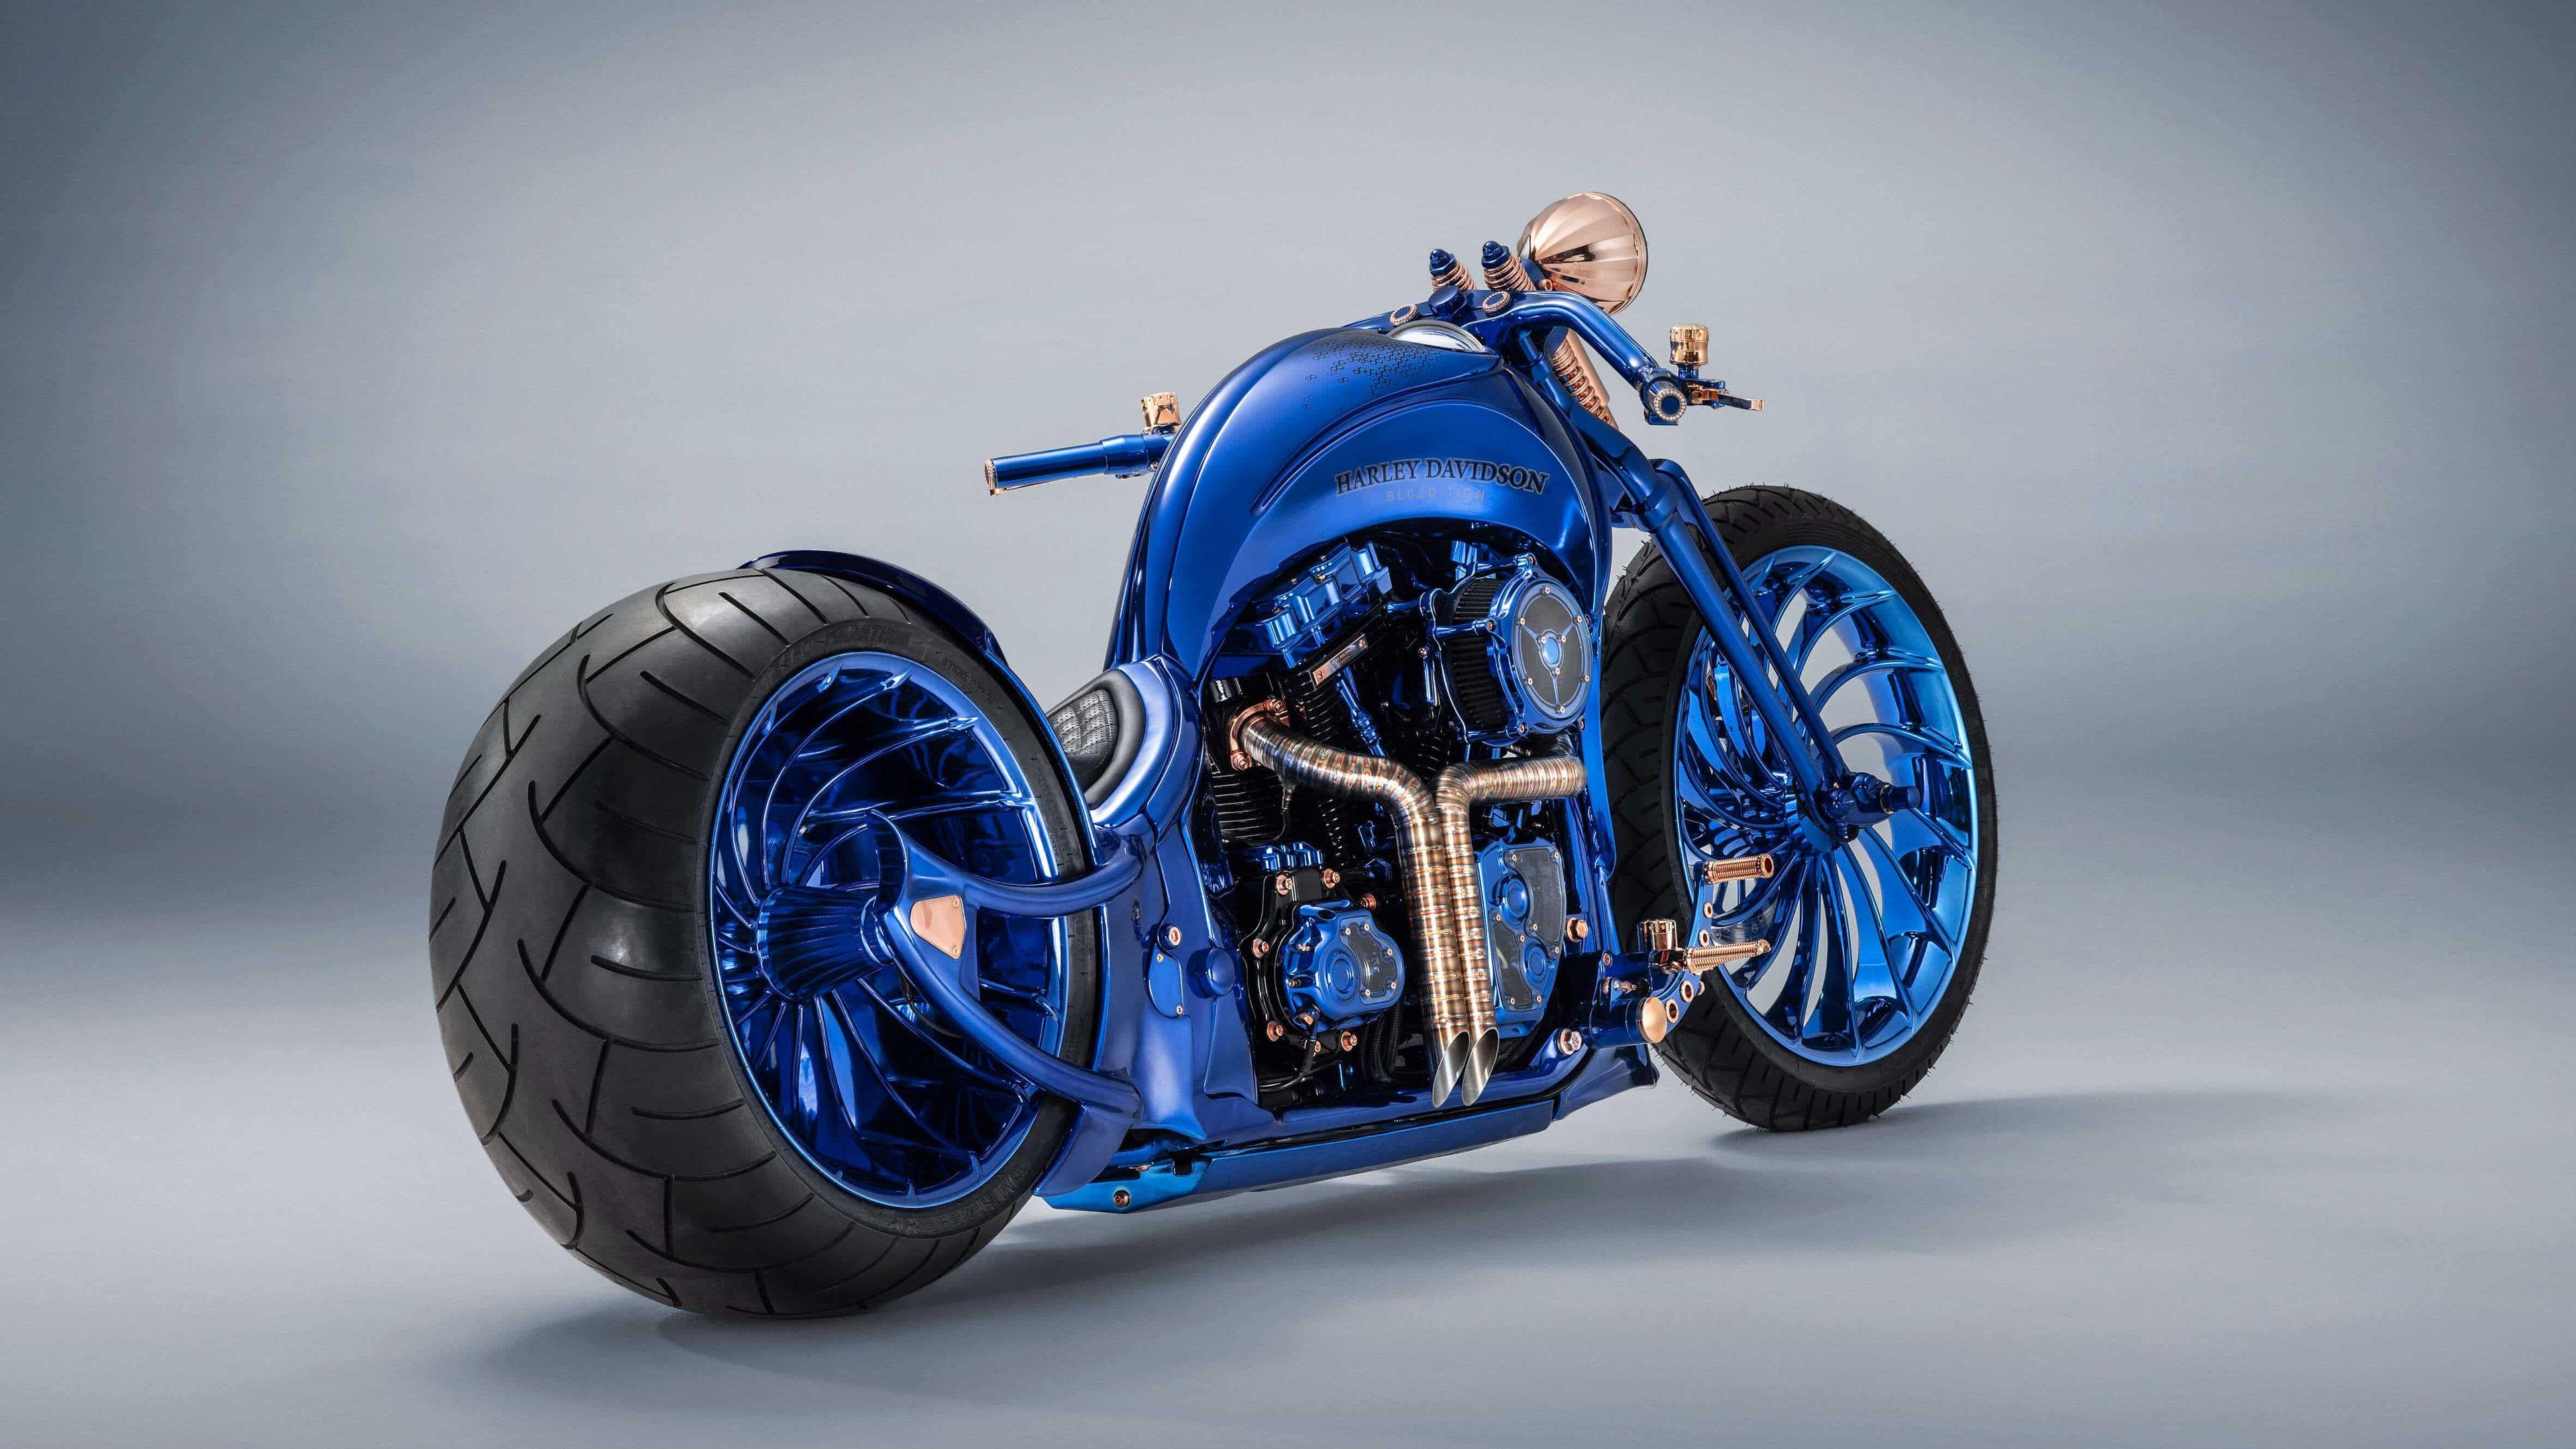 harley davidson blue edition 4k 1547937821 - Harley Davidson Blue Edition 4k - hd-wallpapers, harley davidson wallpapers, bikes wallpapers, 4k-wallpapers